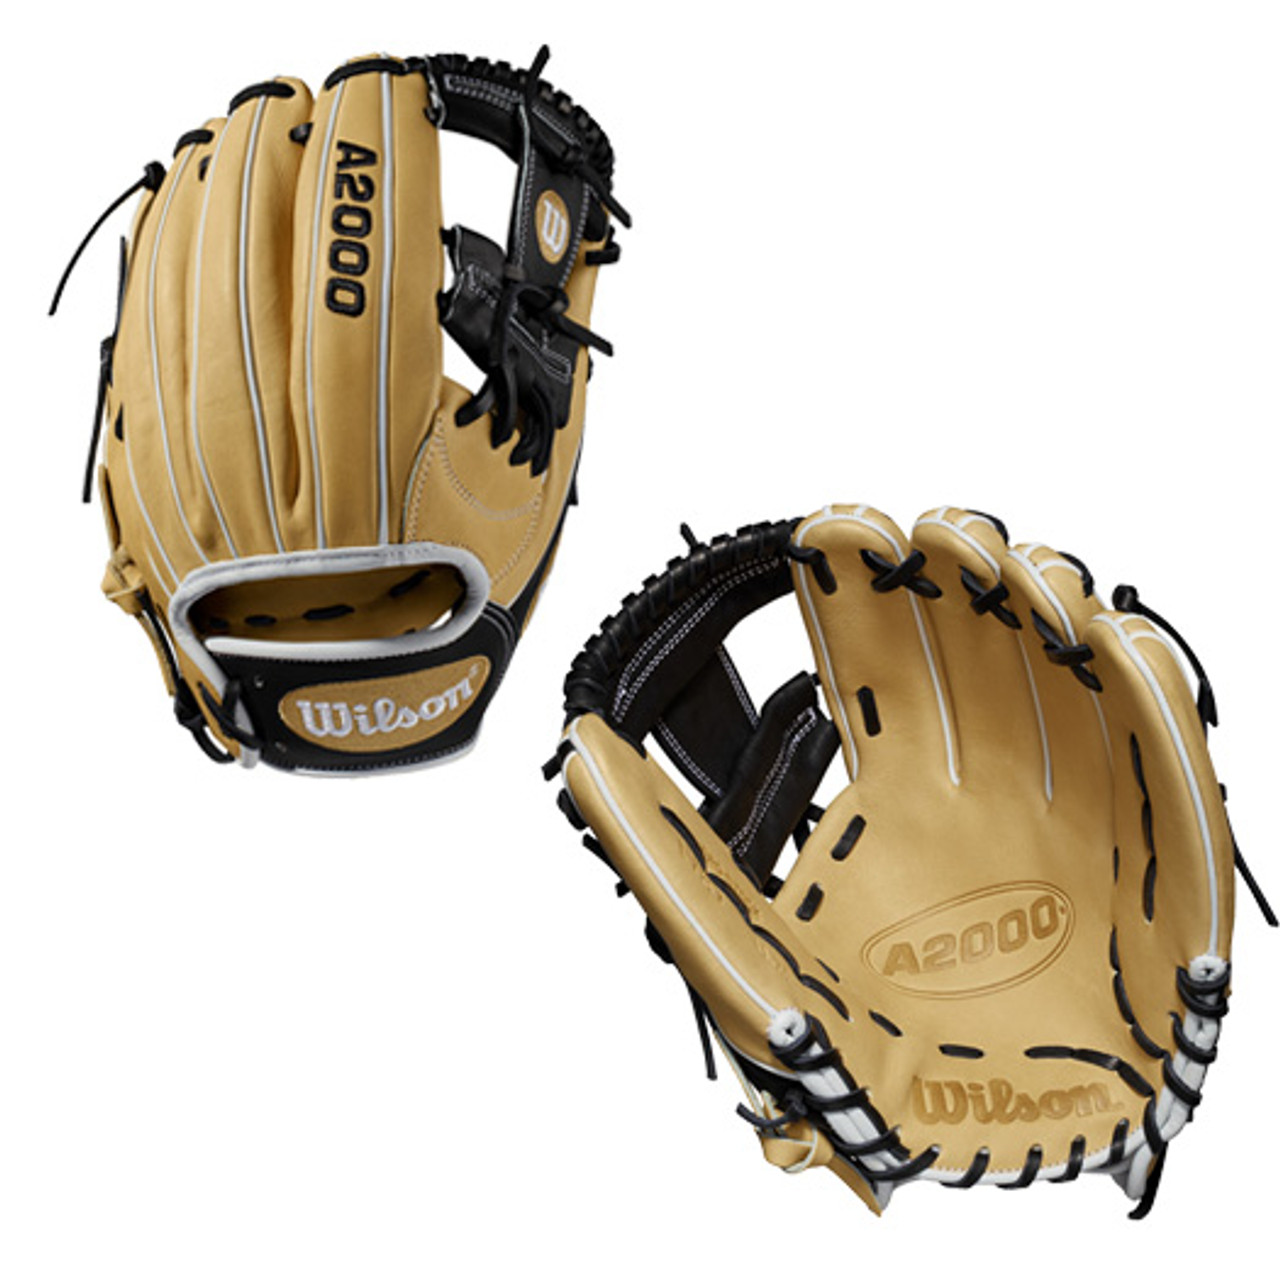 Wilson A2000 1787 1175 Adult Baseball Glove Infield Wta20rb191787